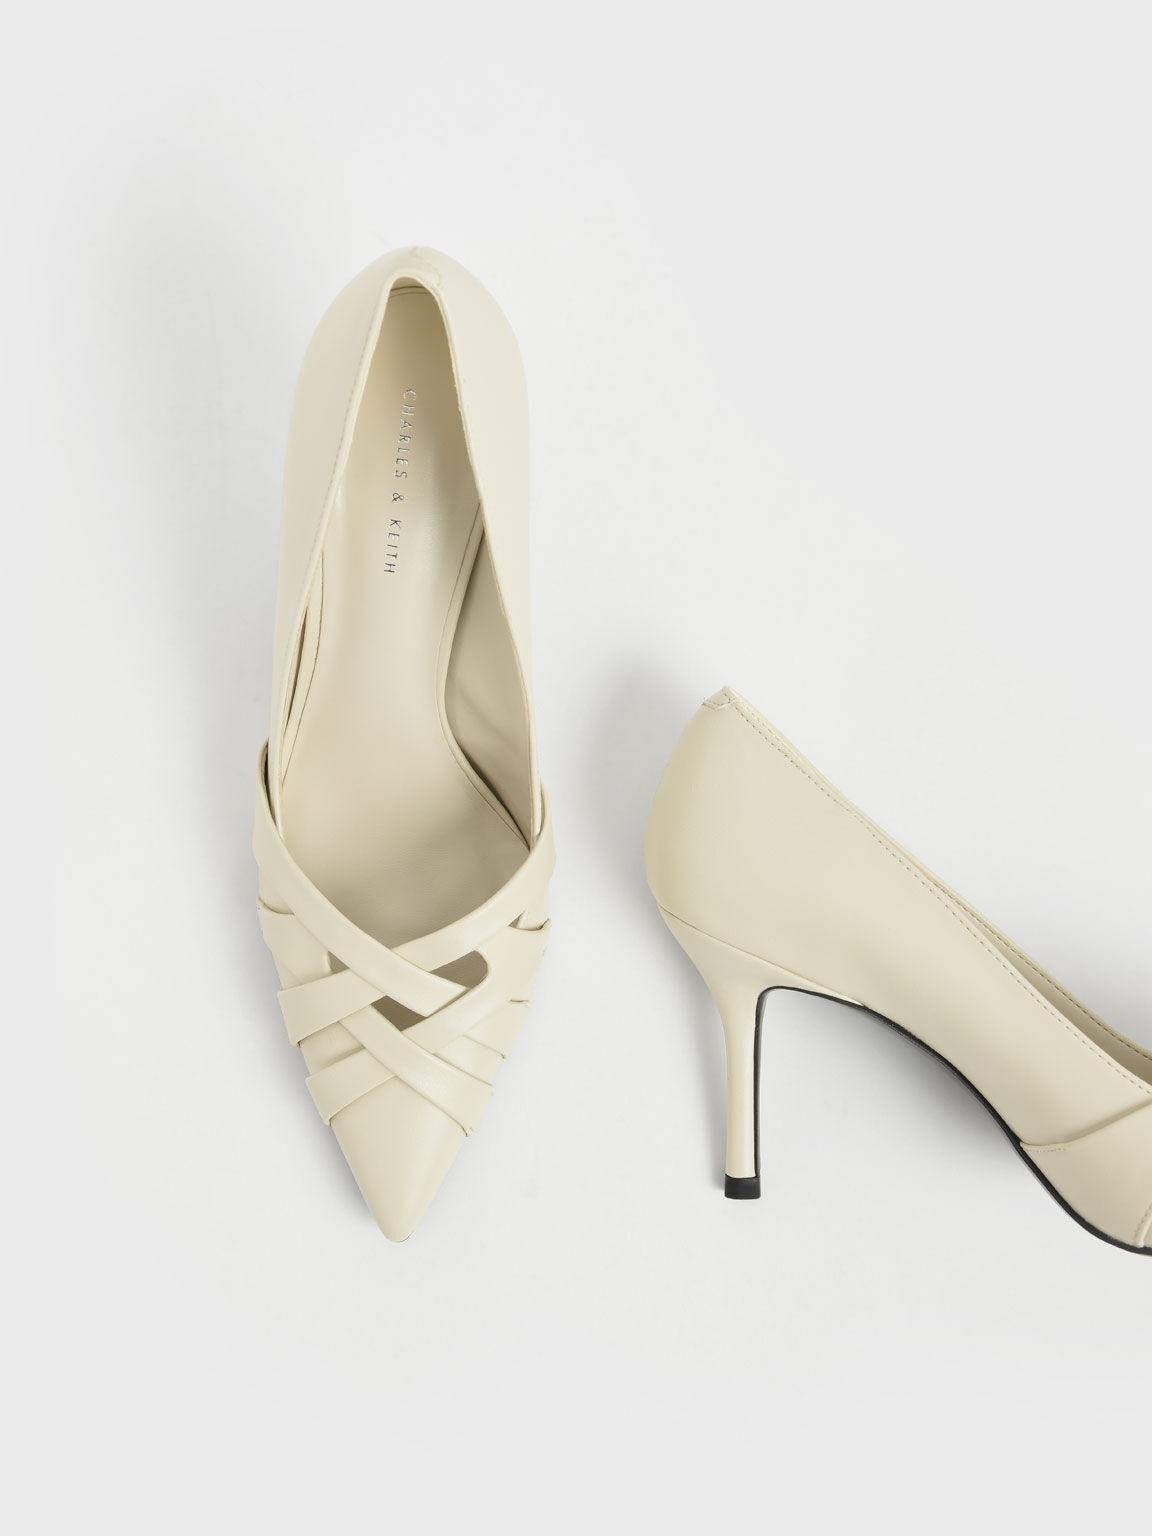 Sepatu Woven Patent Stiletto Pumps, Chalk, hi-res